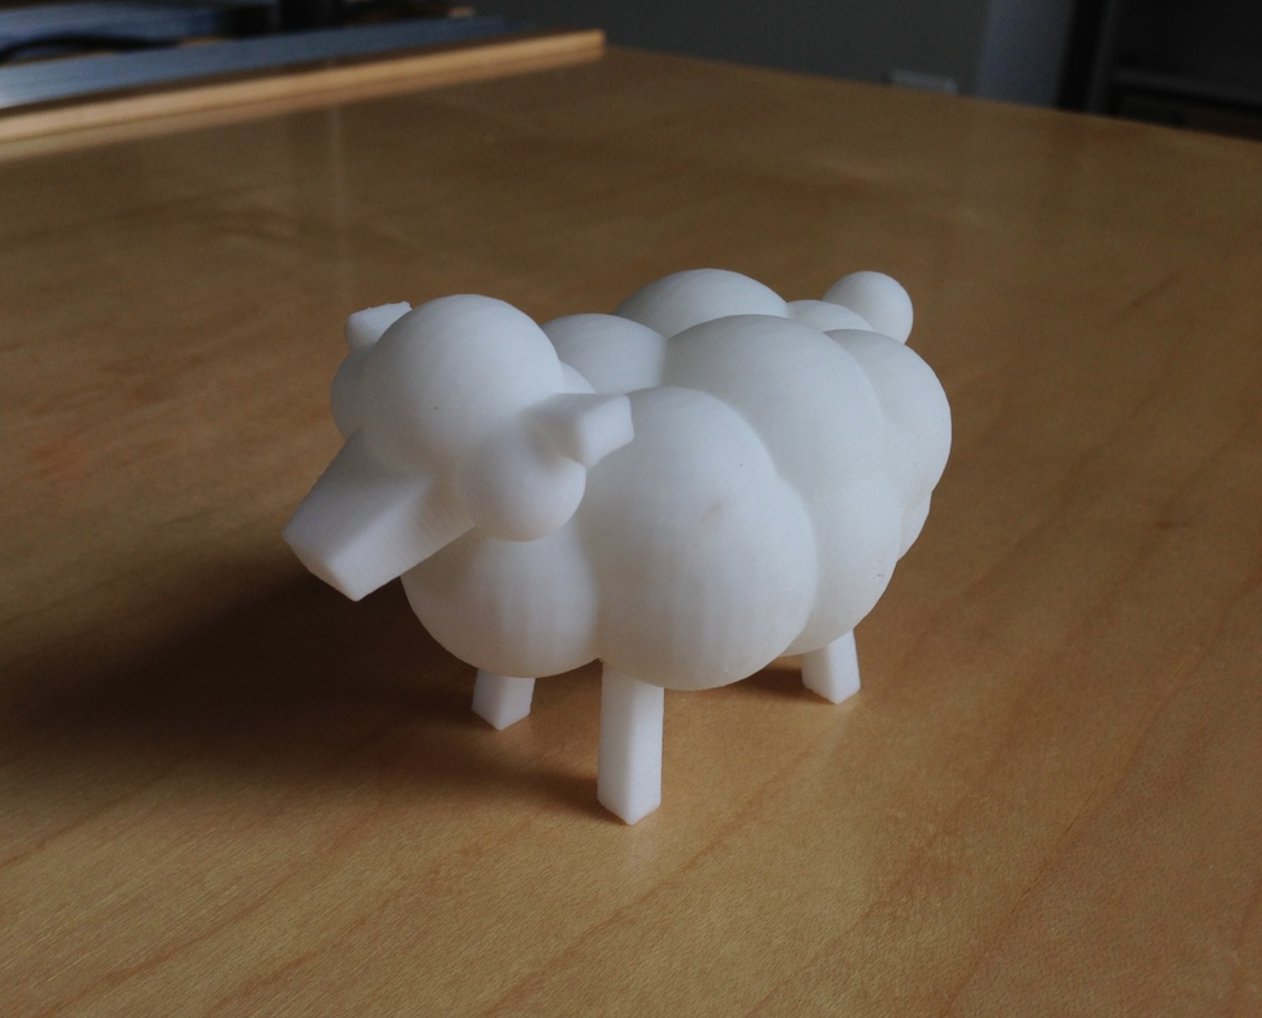 Capture d'écran 2016-10-20 à 15.44.00.png Download free STL file Tiny sheep from LEO the Prince Maker (MINIATURE) • 3D print template, leothemakerprince